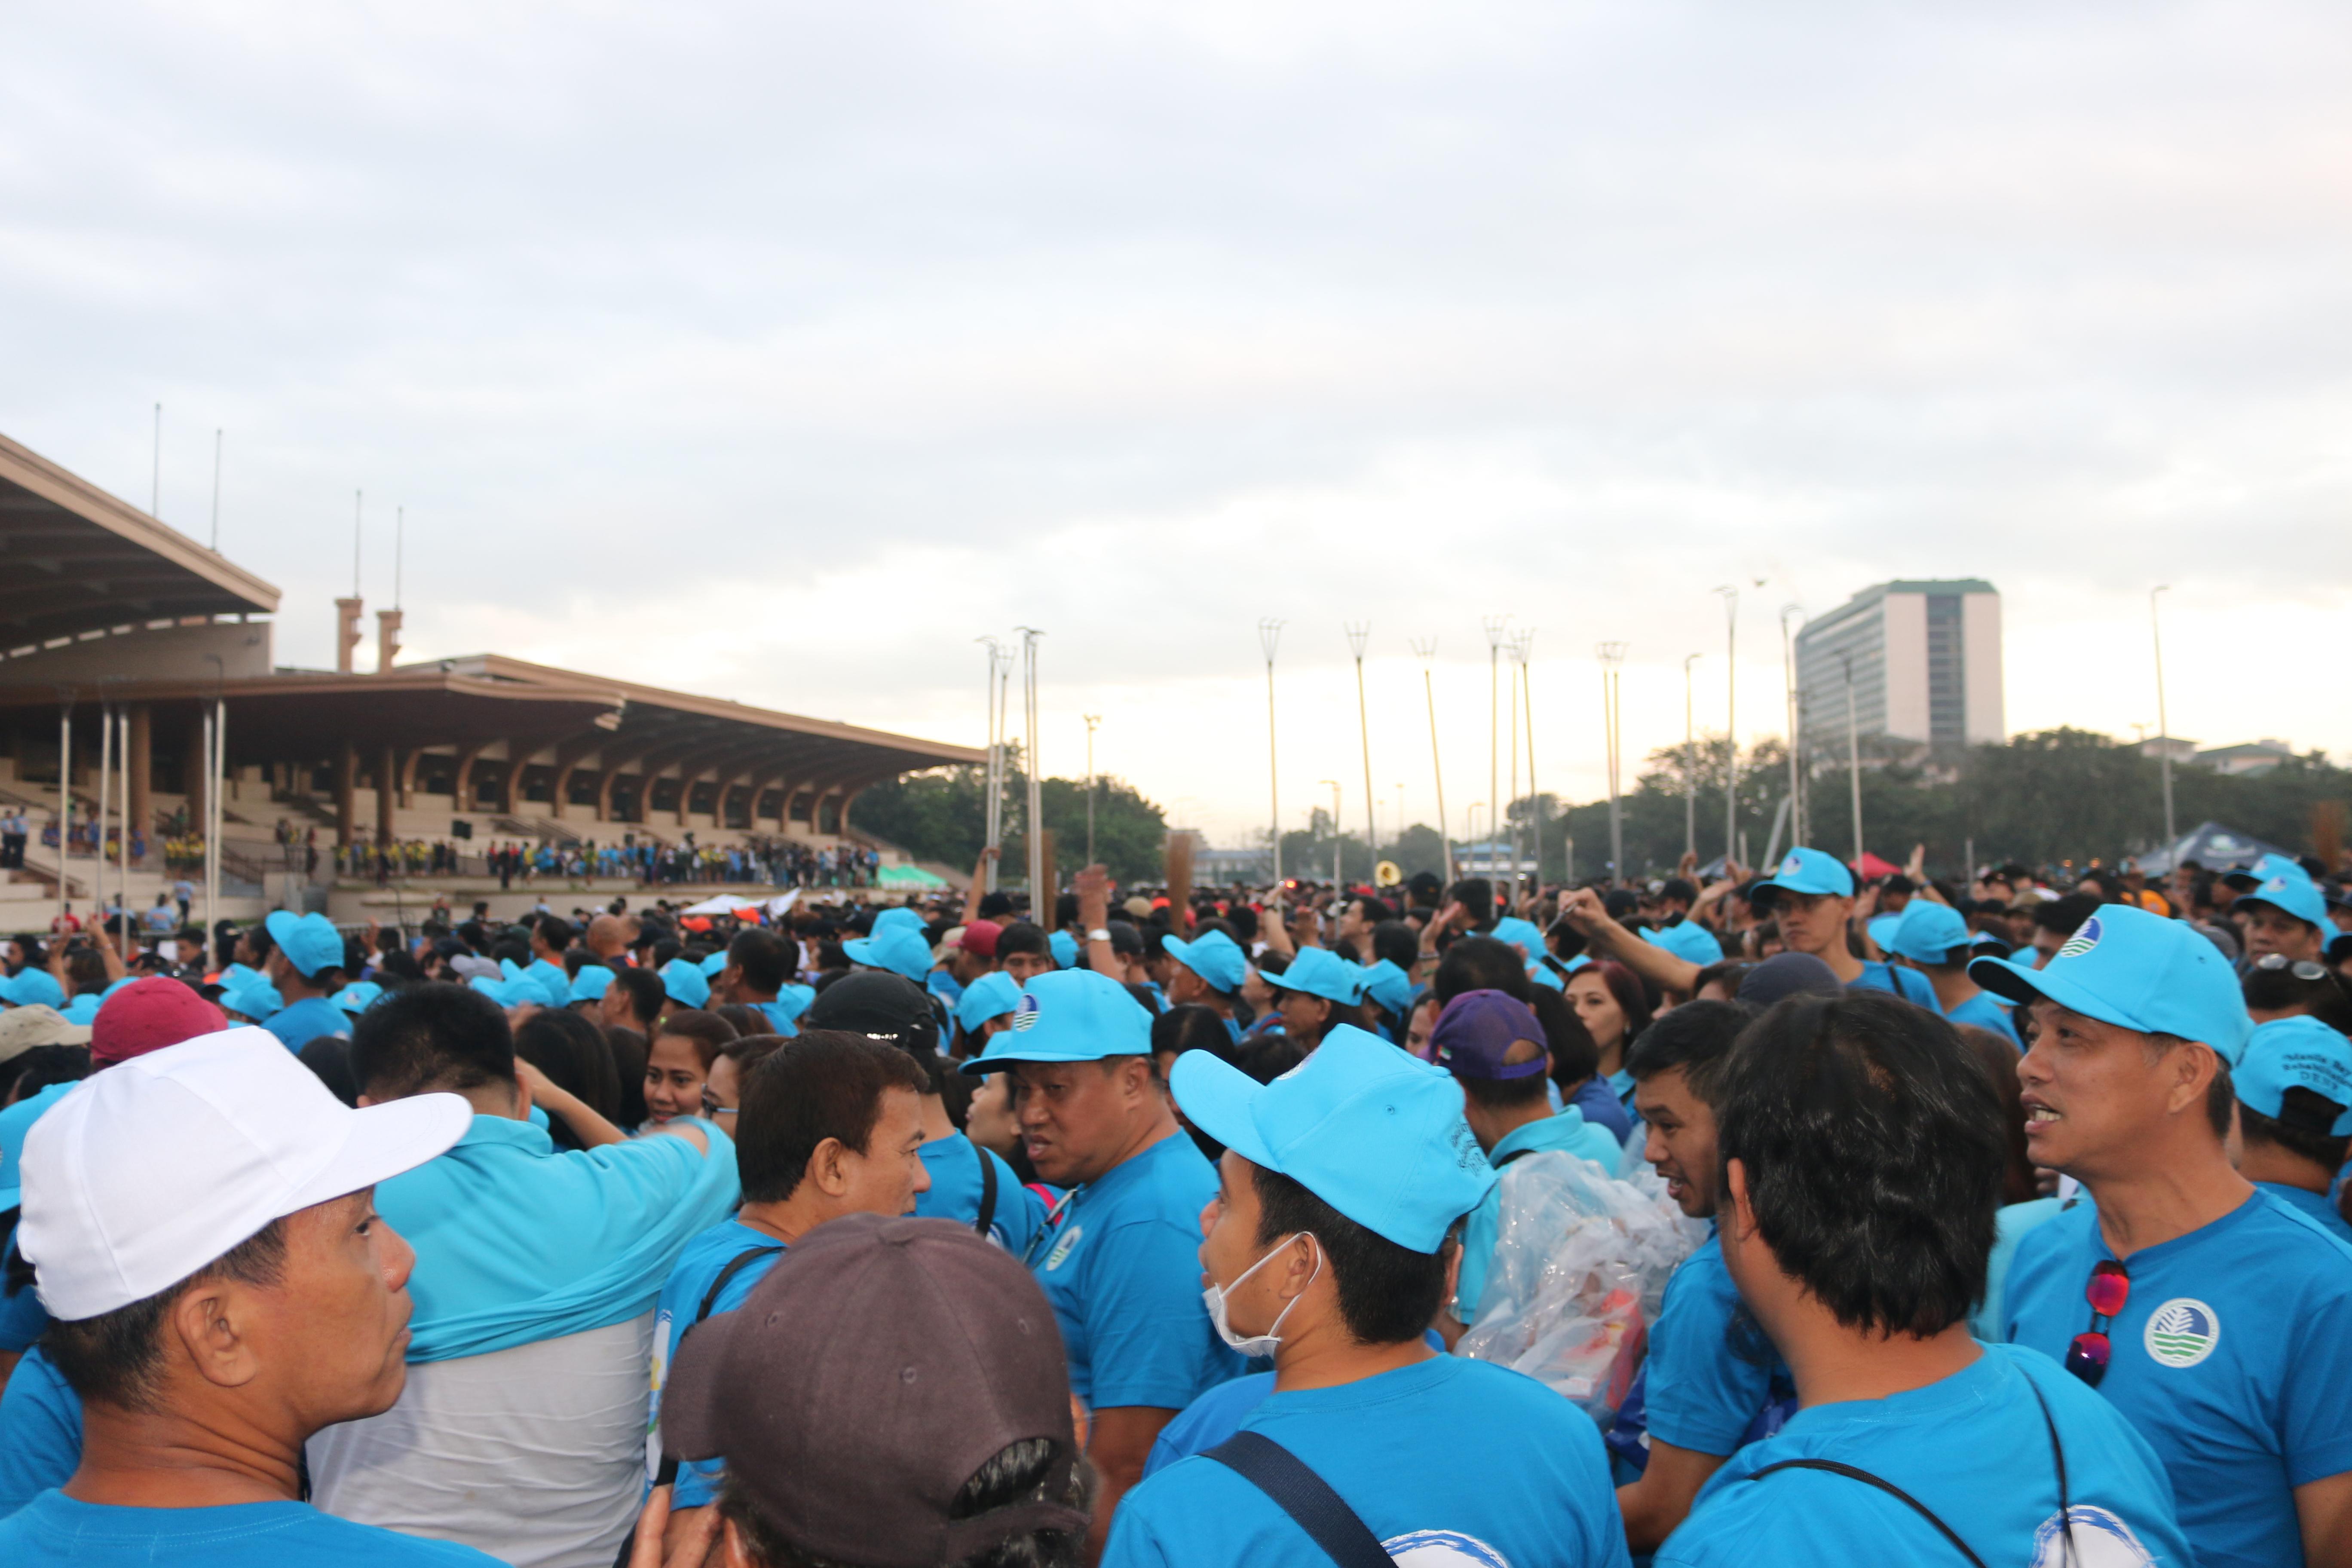 DENR staff at Quirino Grandstand